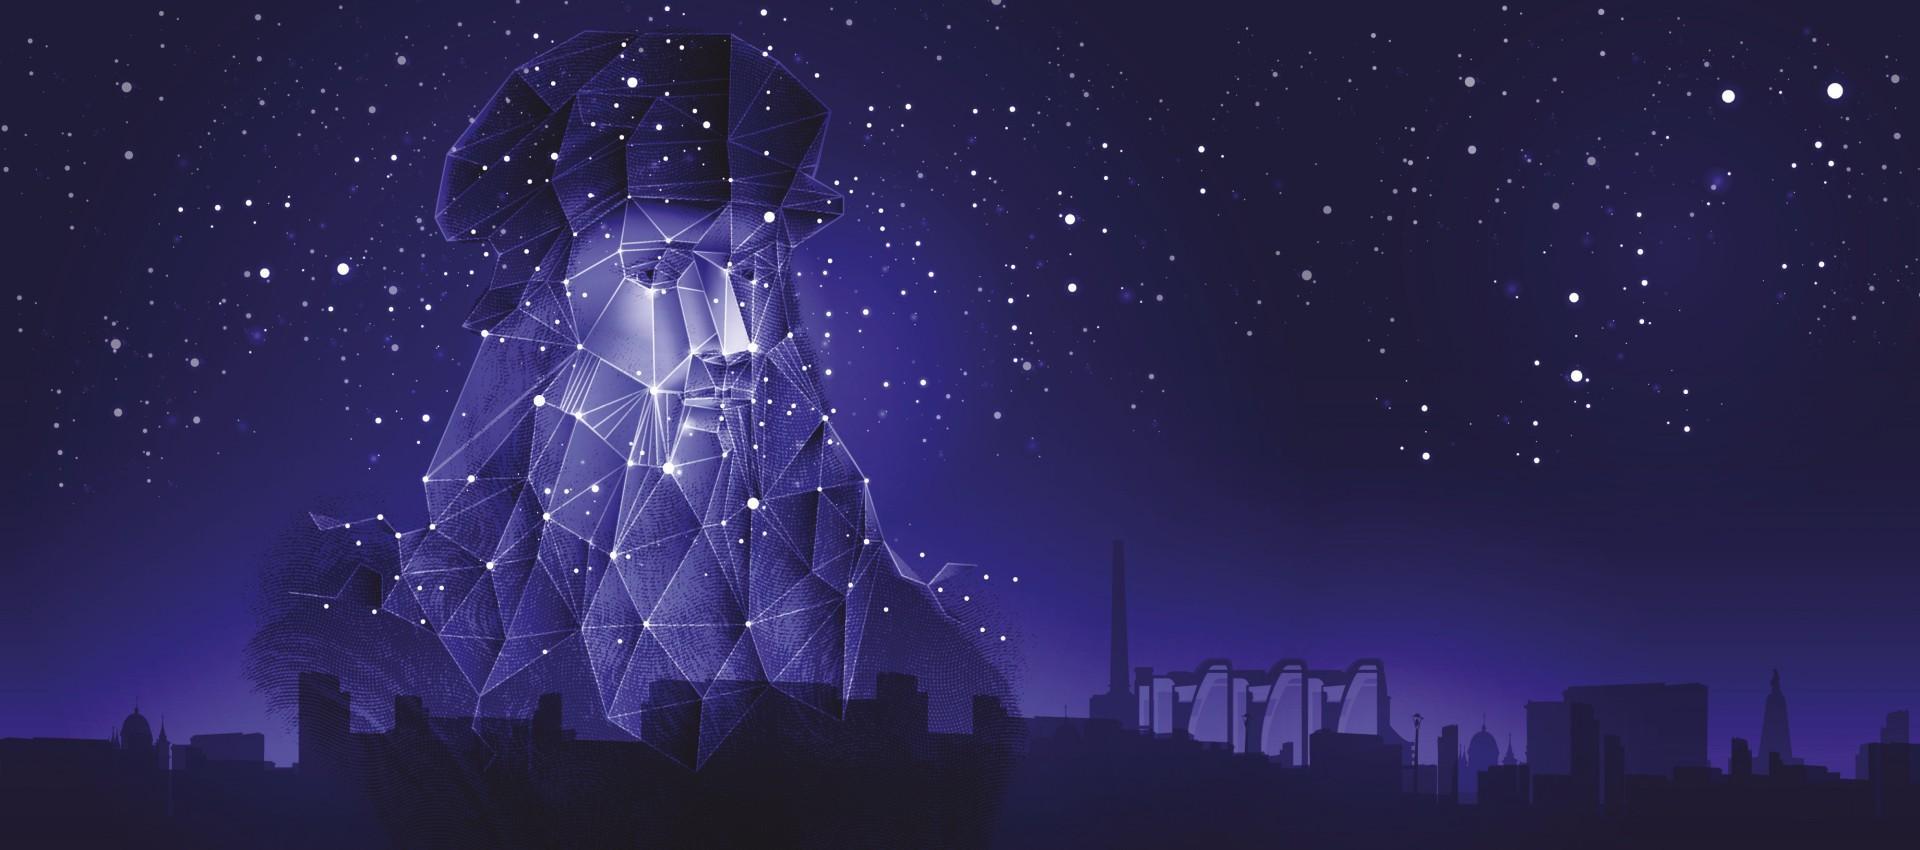 Leonardo da Vinci - Energia Umysłu